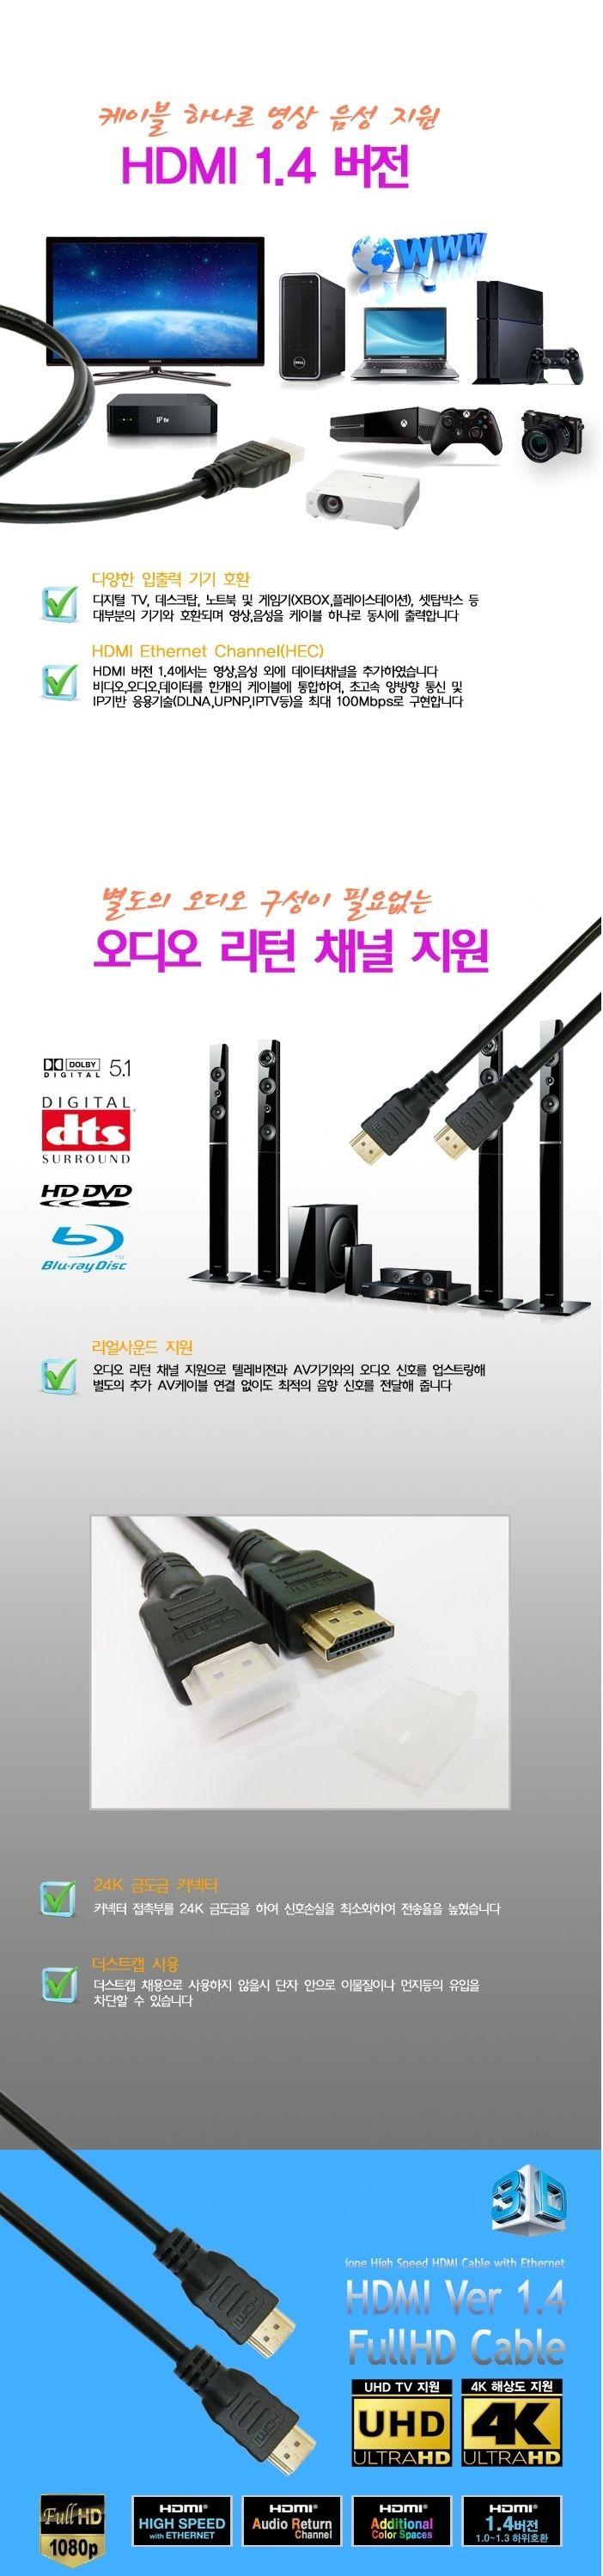 HDMI 1.4 보급형 케이블 1.5M(DHC00243) 마이크로HDMI 마이크로HDMI HDMI캐이블 3D 컴퓨터선 HDMI젠더